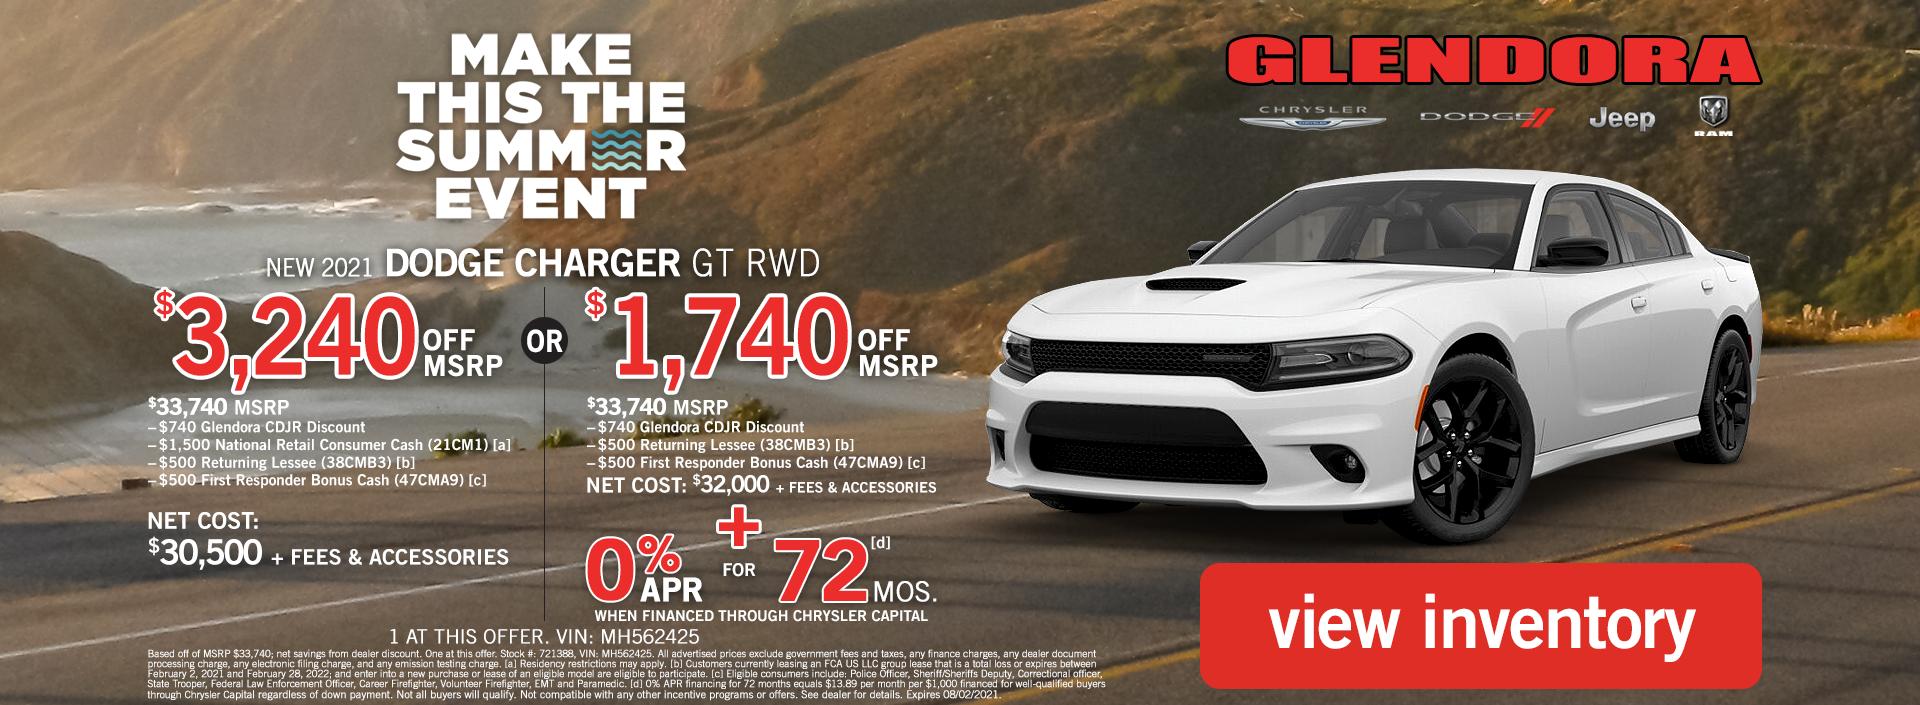 Dodge Charger Deals July 2021